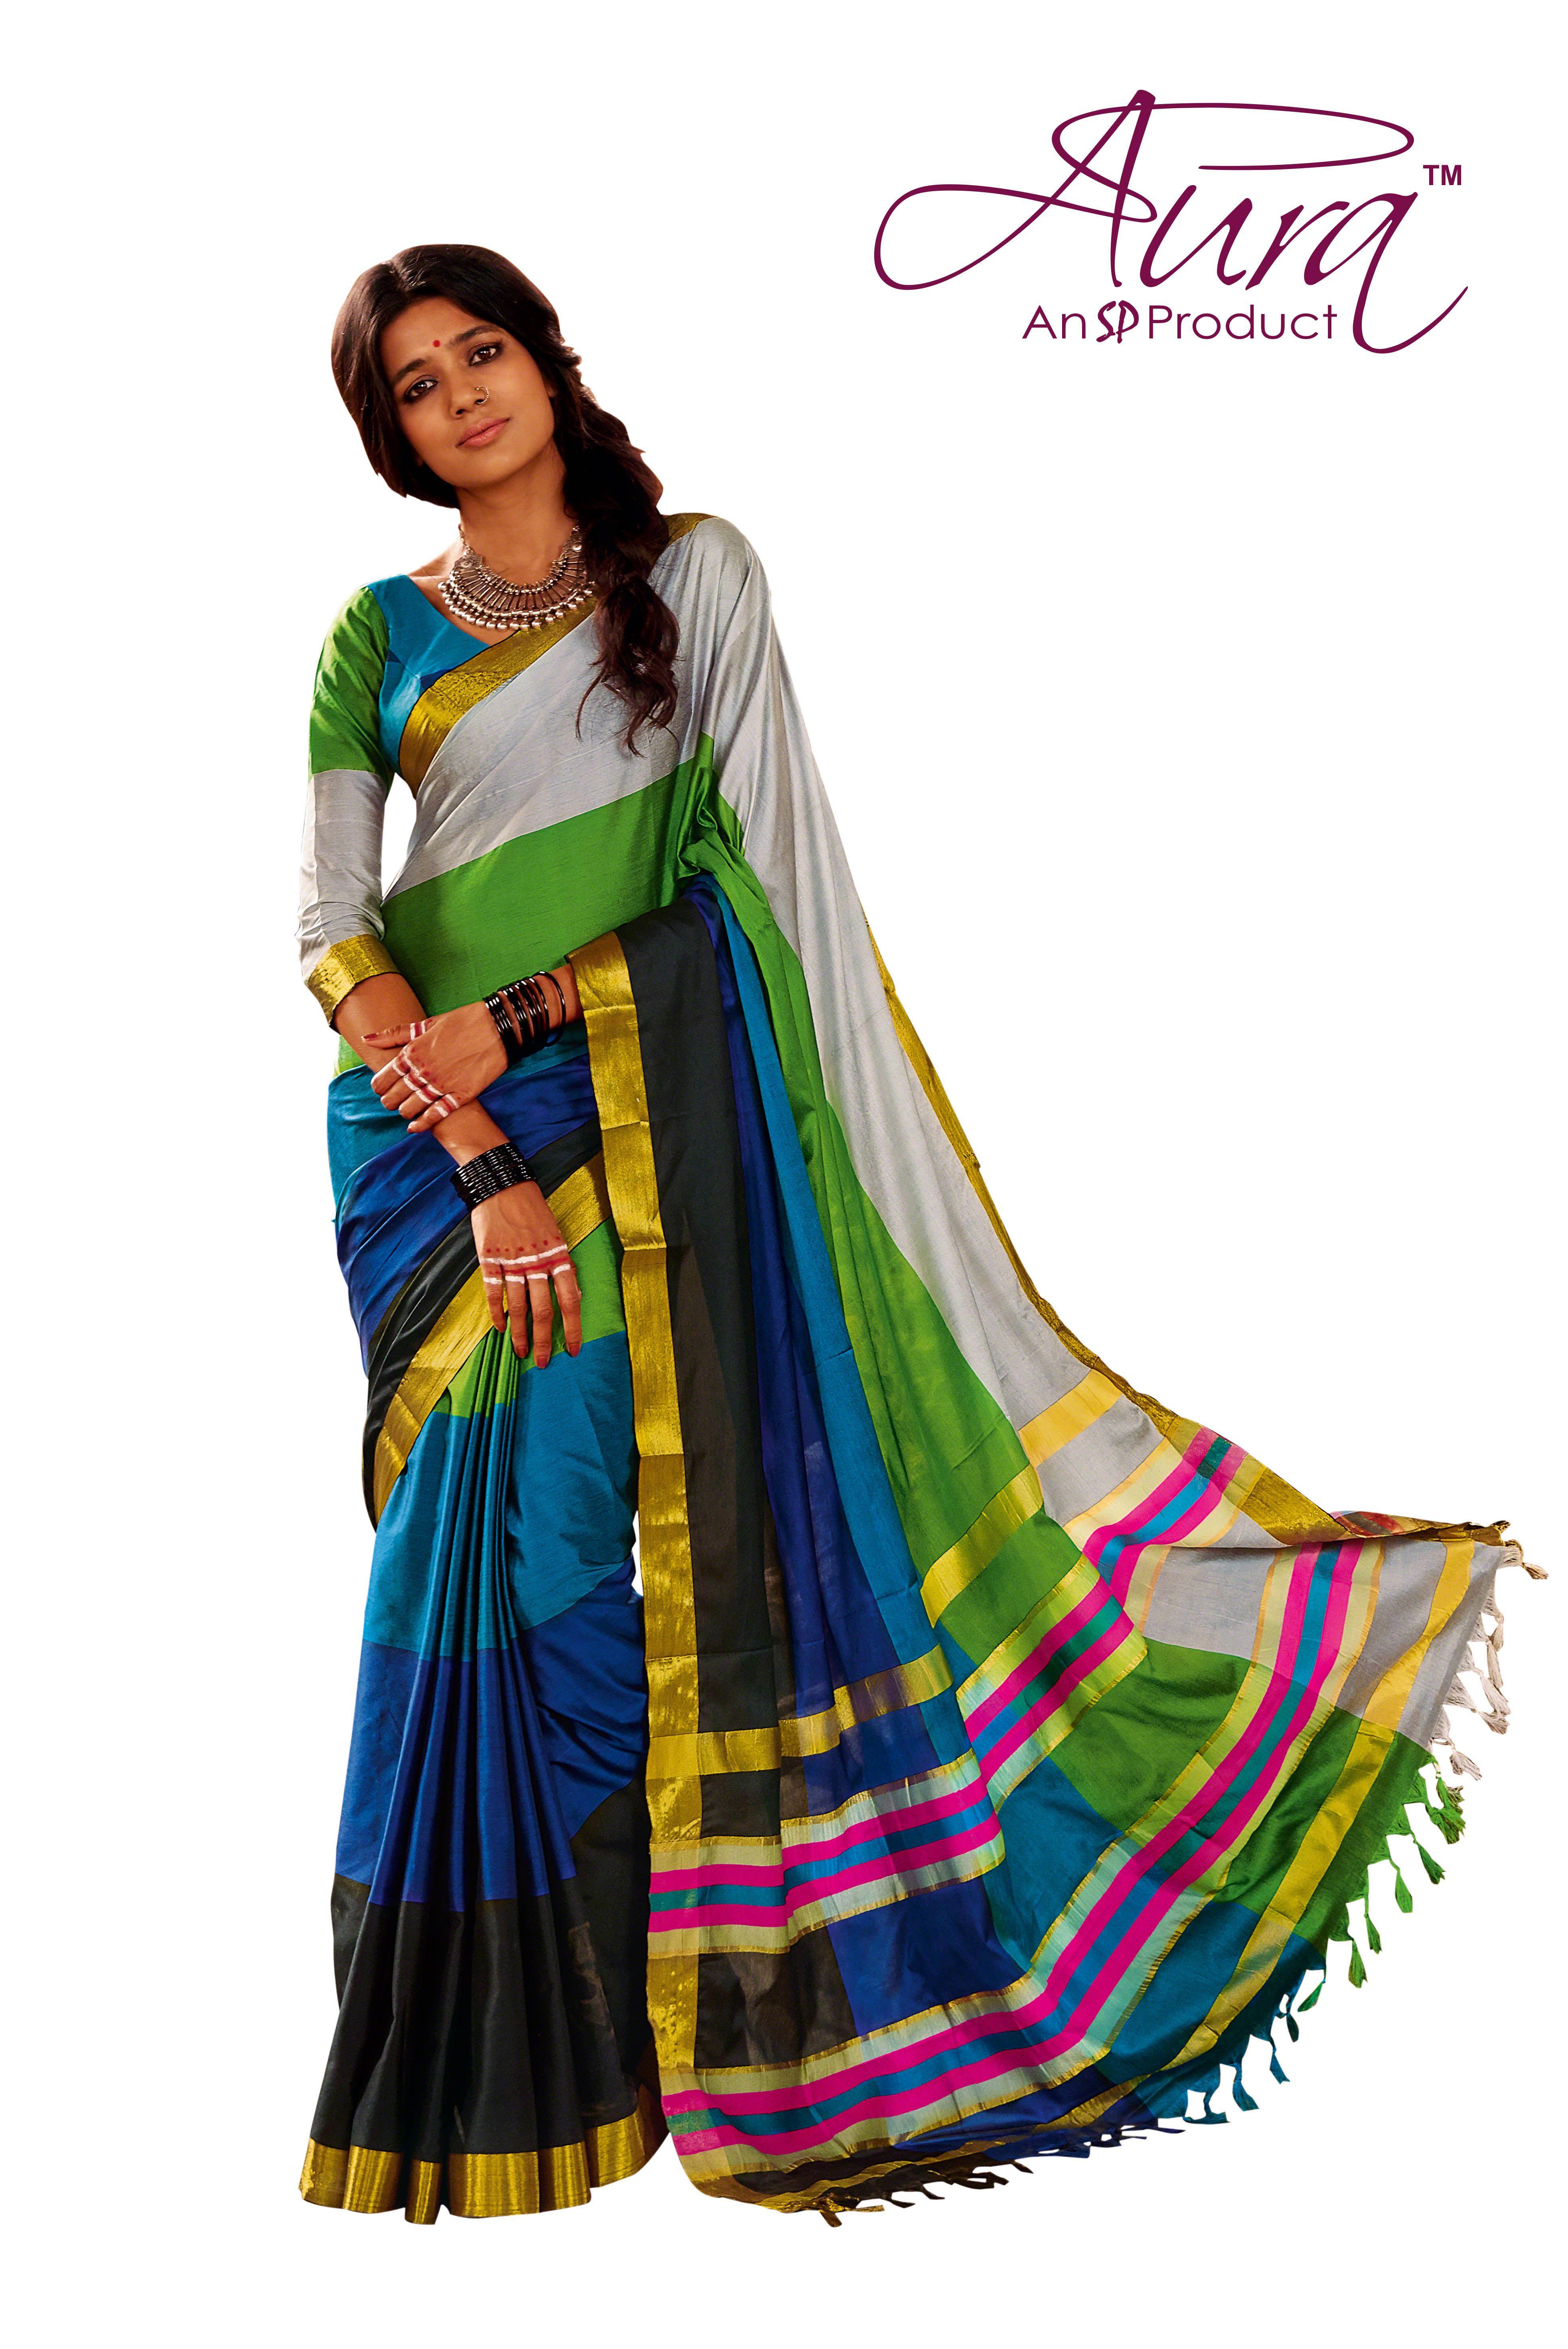 2100c759e2 Multicolour Saree with Golden Border- Rs 1299 Shop now: www.aurastudio.in  #multicoloursarees #Sarees #IndianSarees #CoutureSarees #WomenClothing